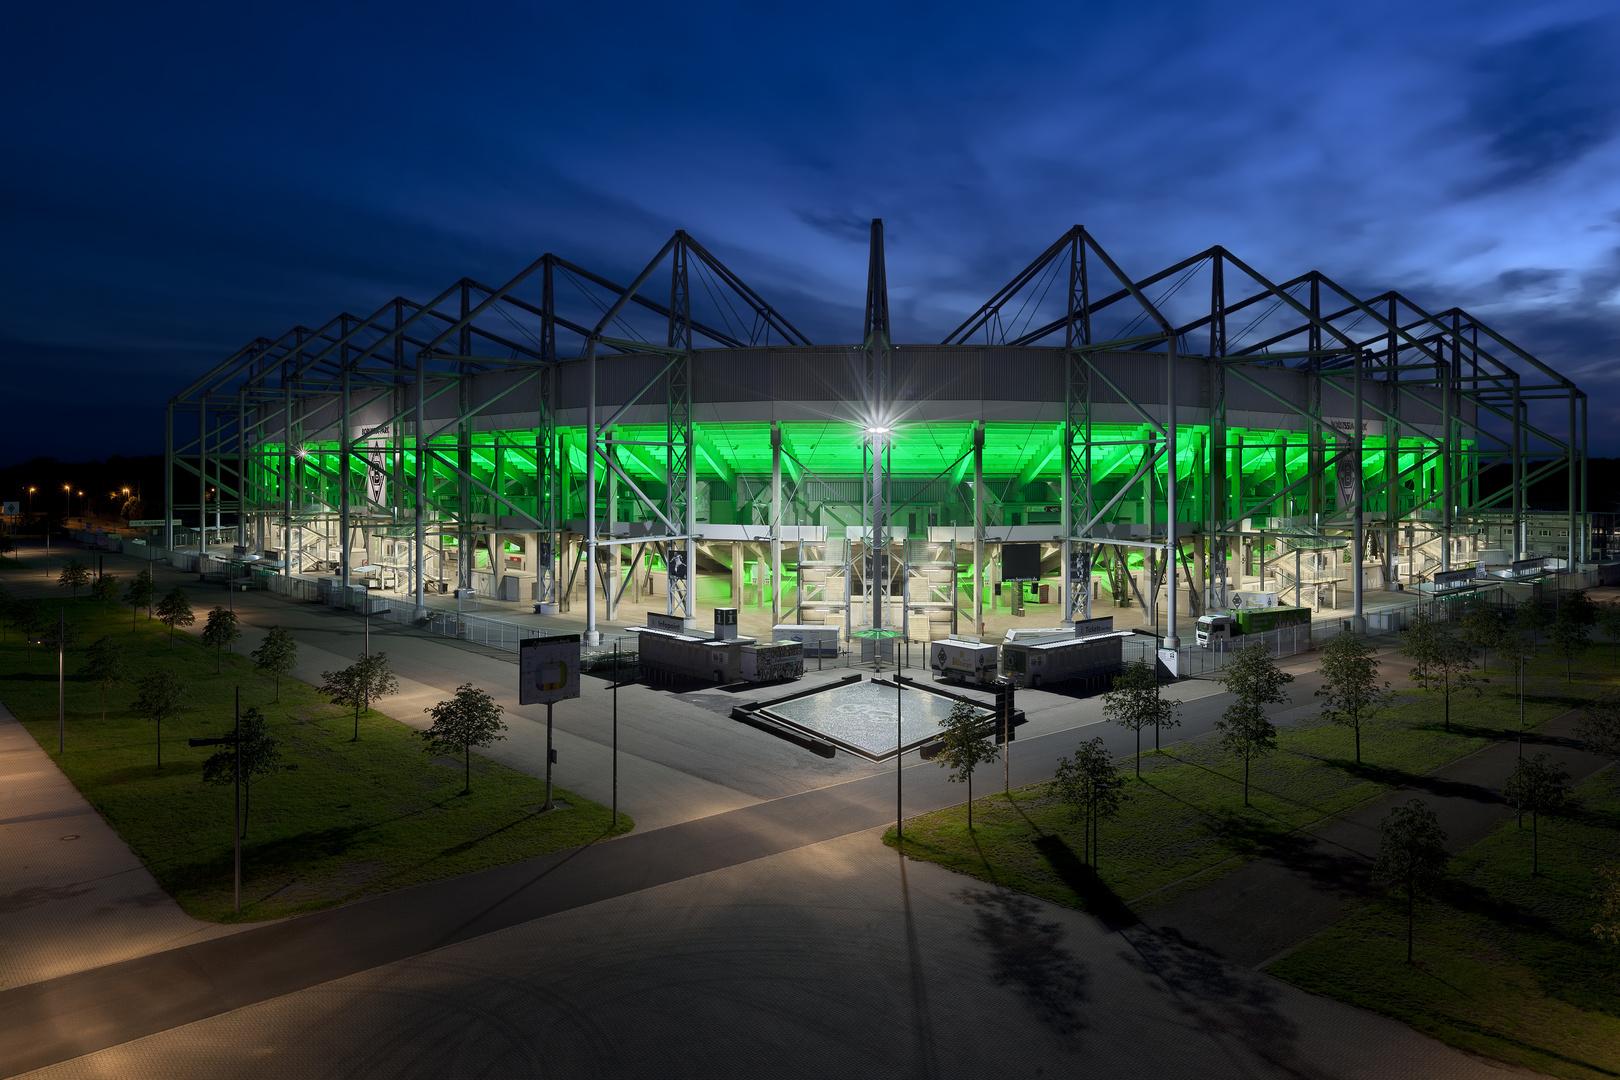 Borussia Park I – Borussia Mönchengladbach – Wolkenstimmung